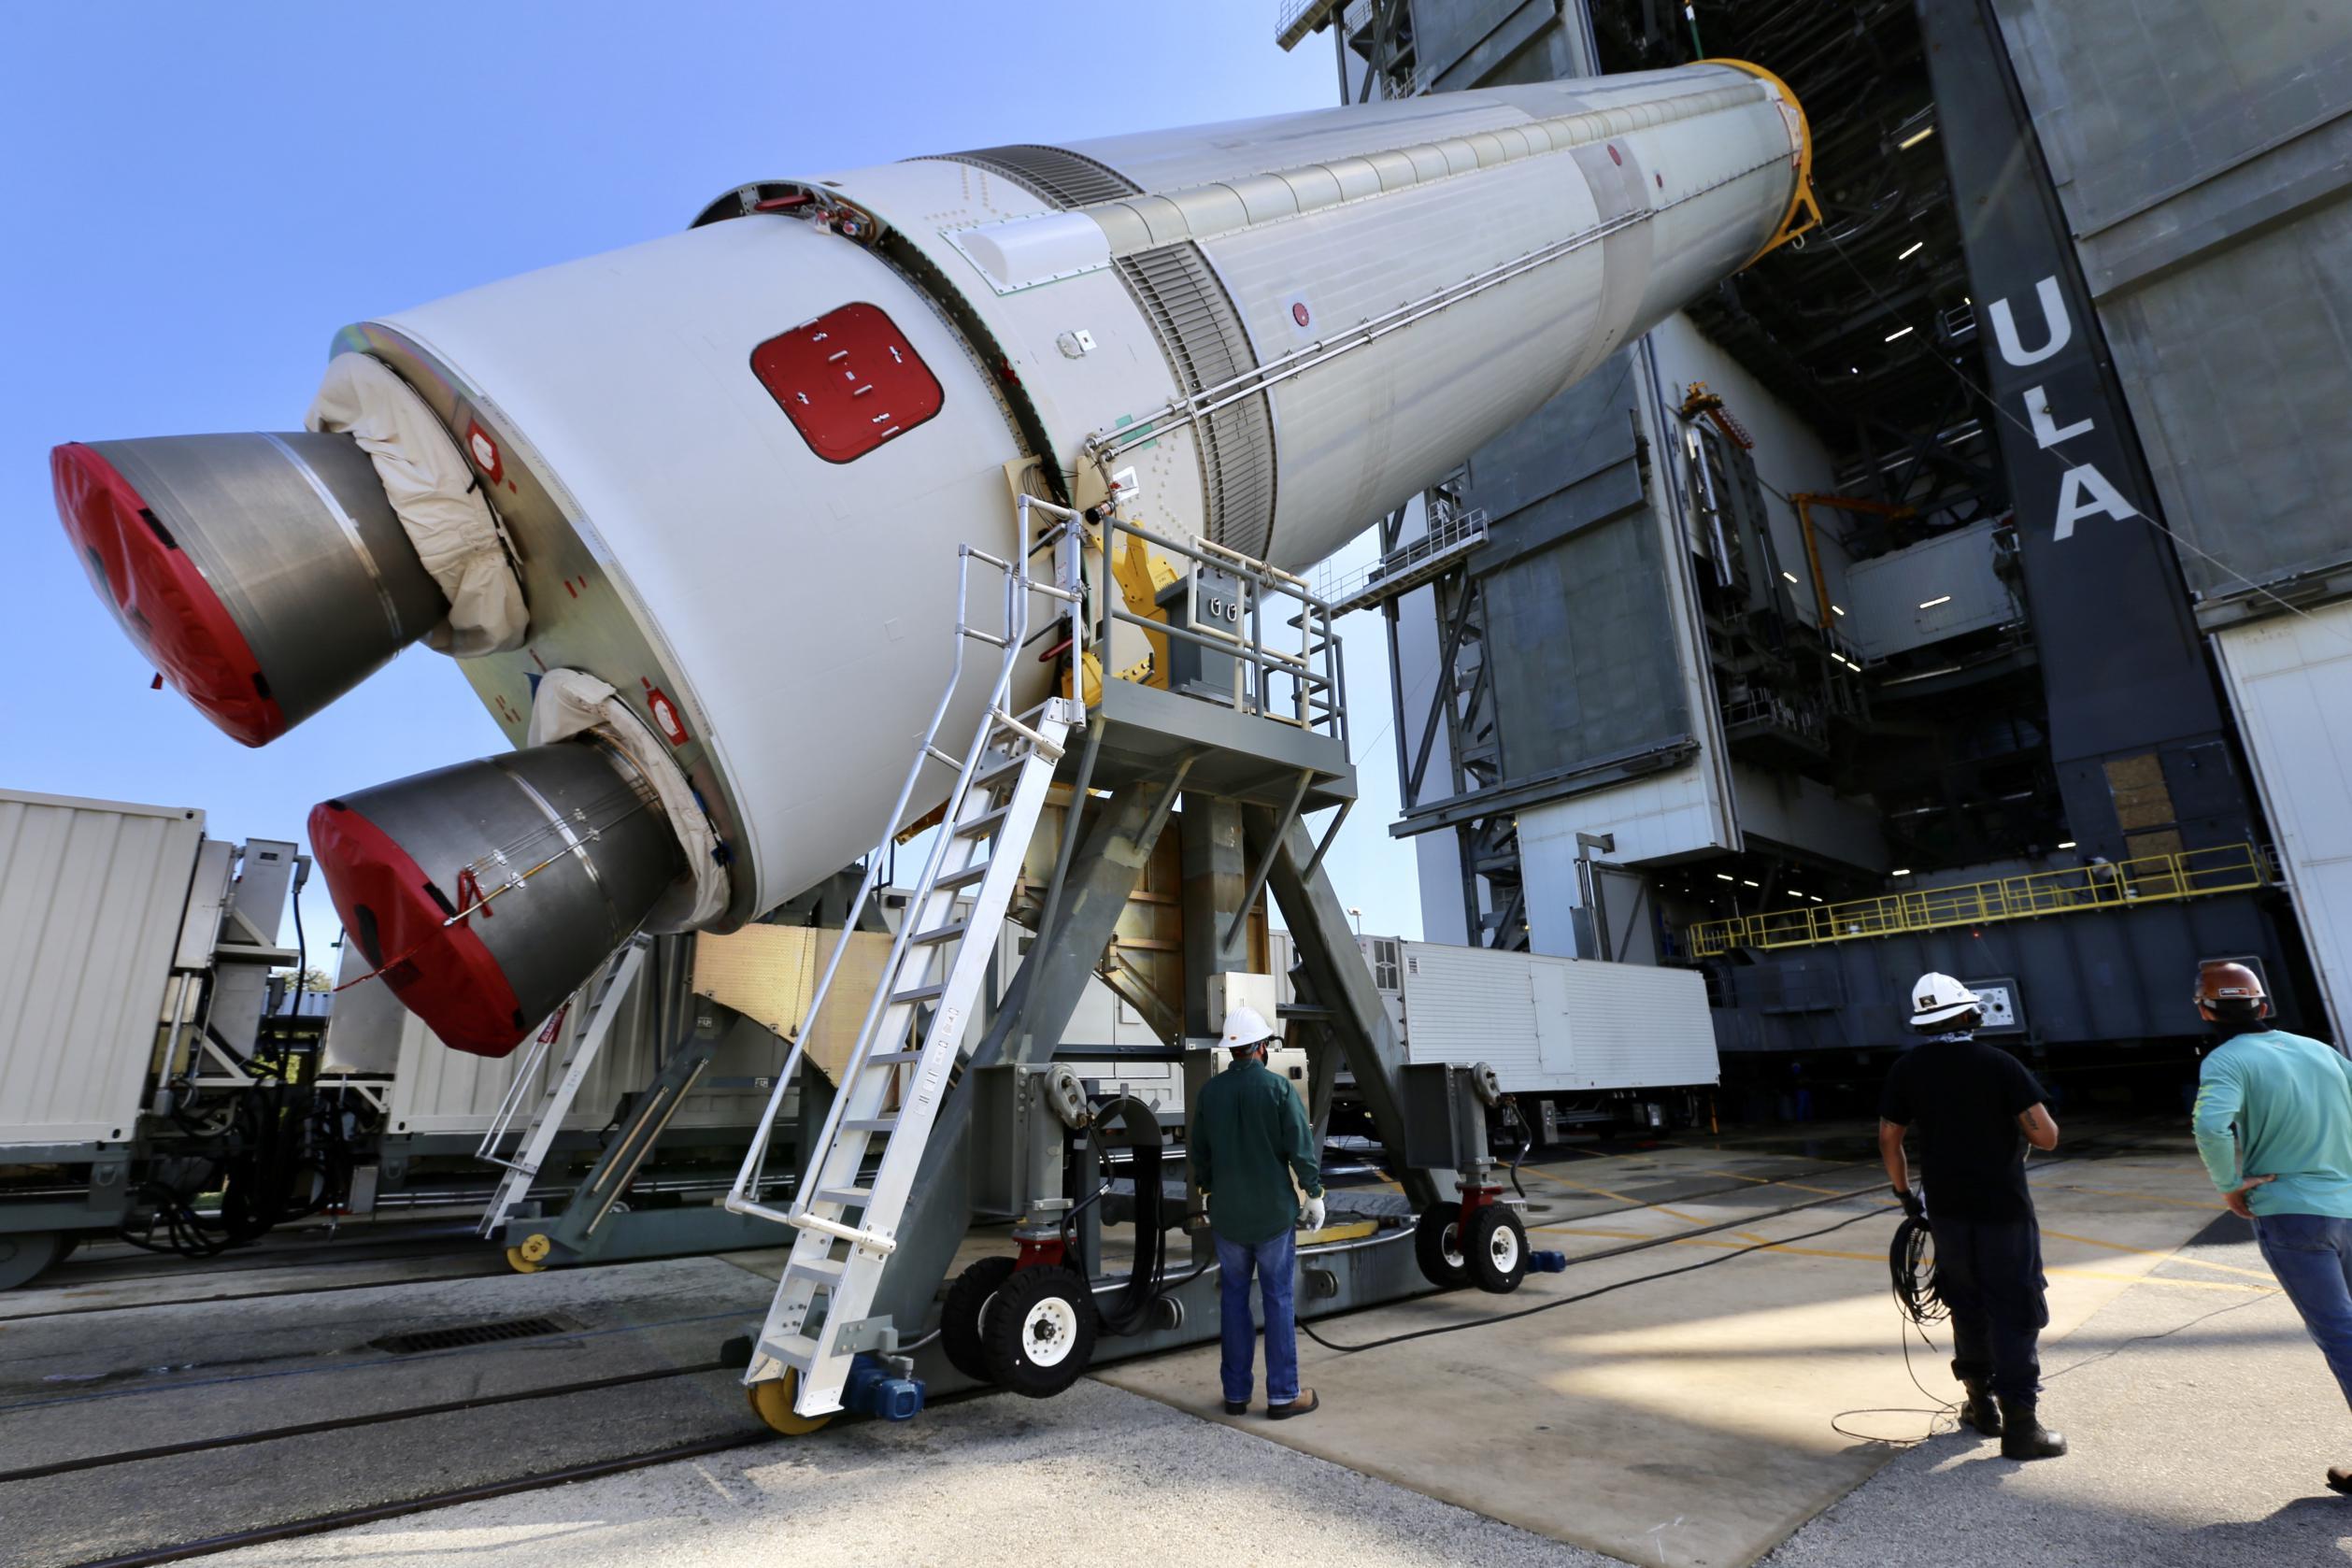 Vulcan pathfinder LC-41 arrival 021521 (ULA) 8 (c)